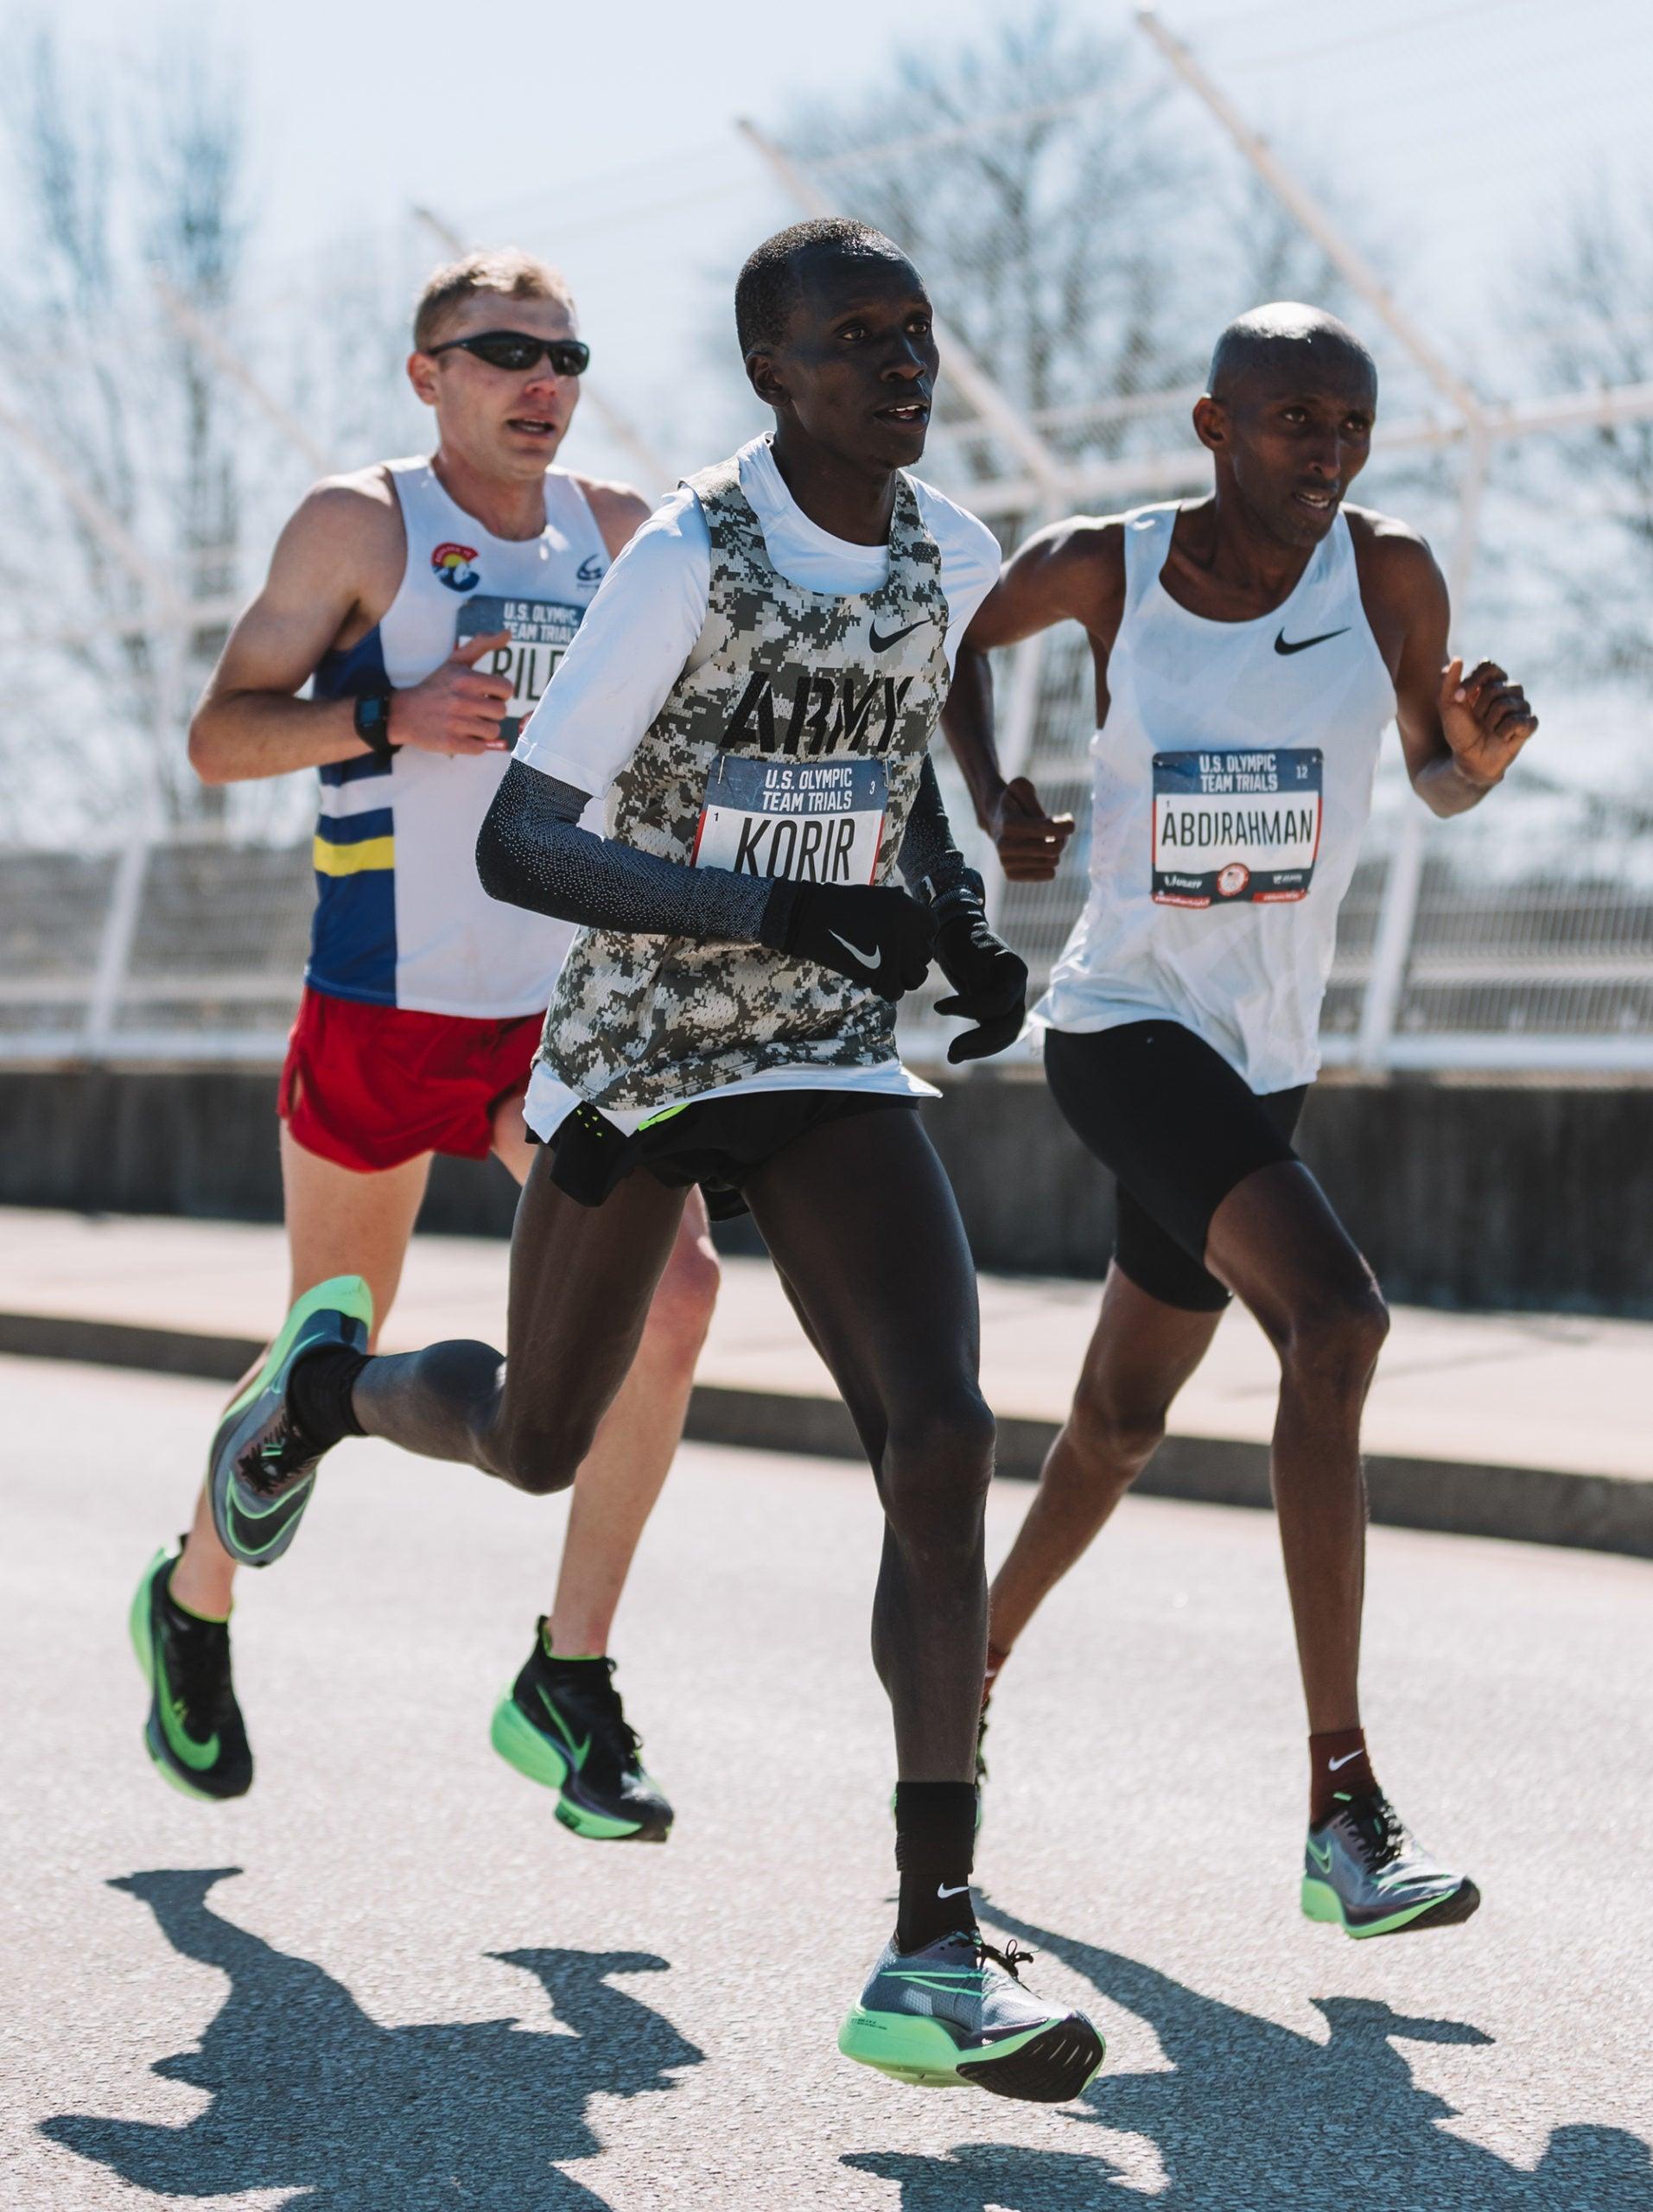 Riley, Korir, Abdirahman Olympic Trials